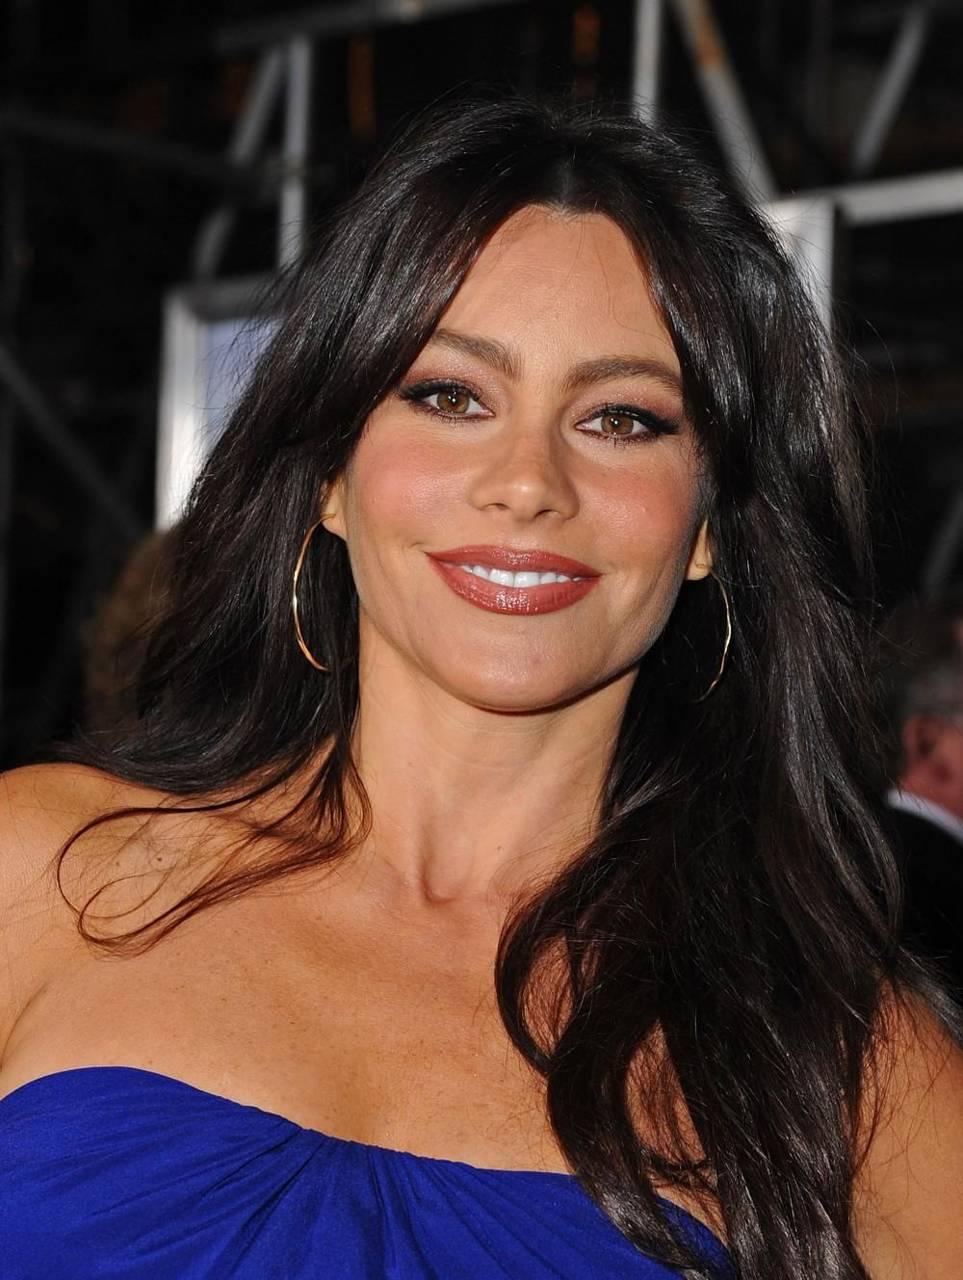 Sofia Vargara